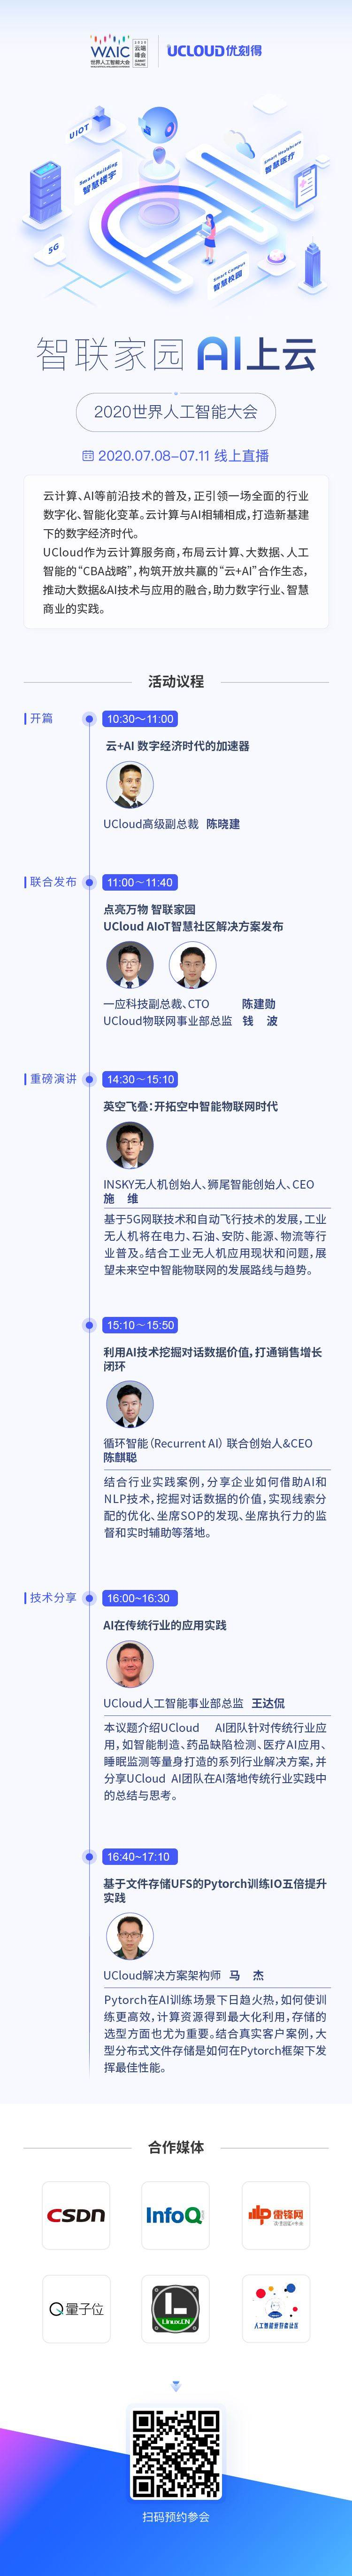 【UCloud直播间】人工智能大会期间节目议程.jpg